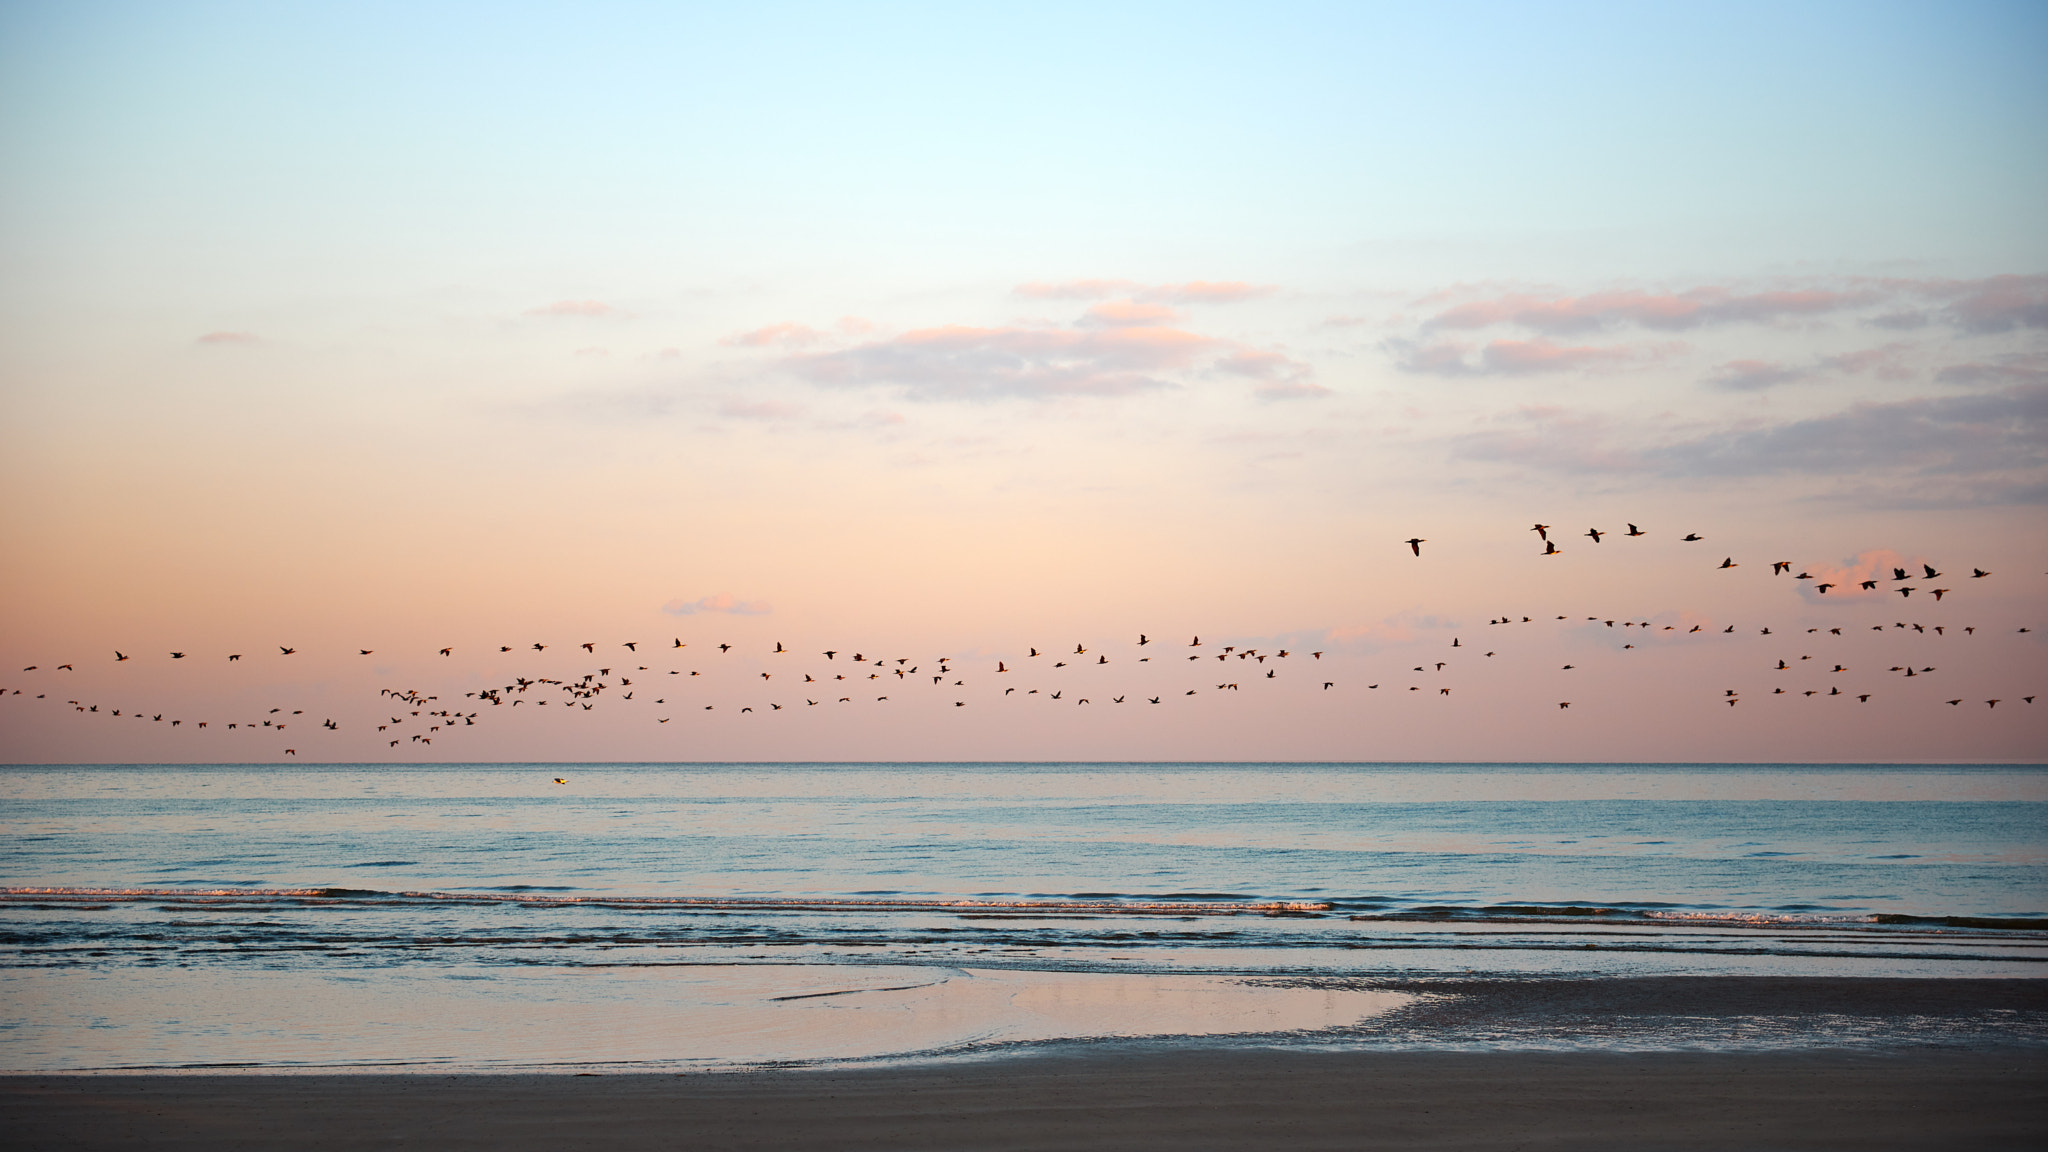 Flock of birds flying along shoreline at dawn